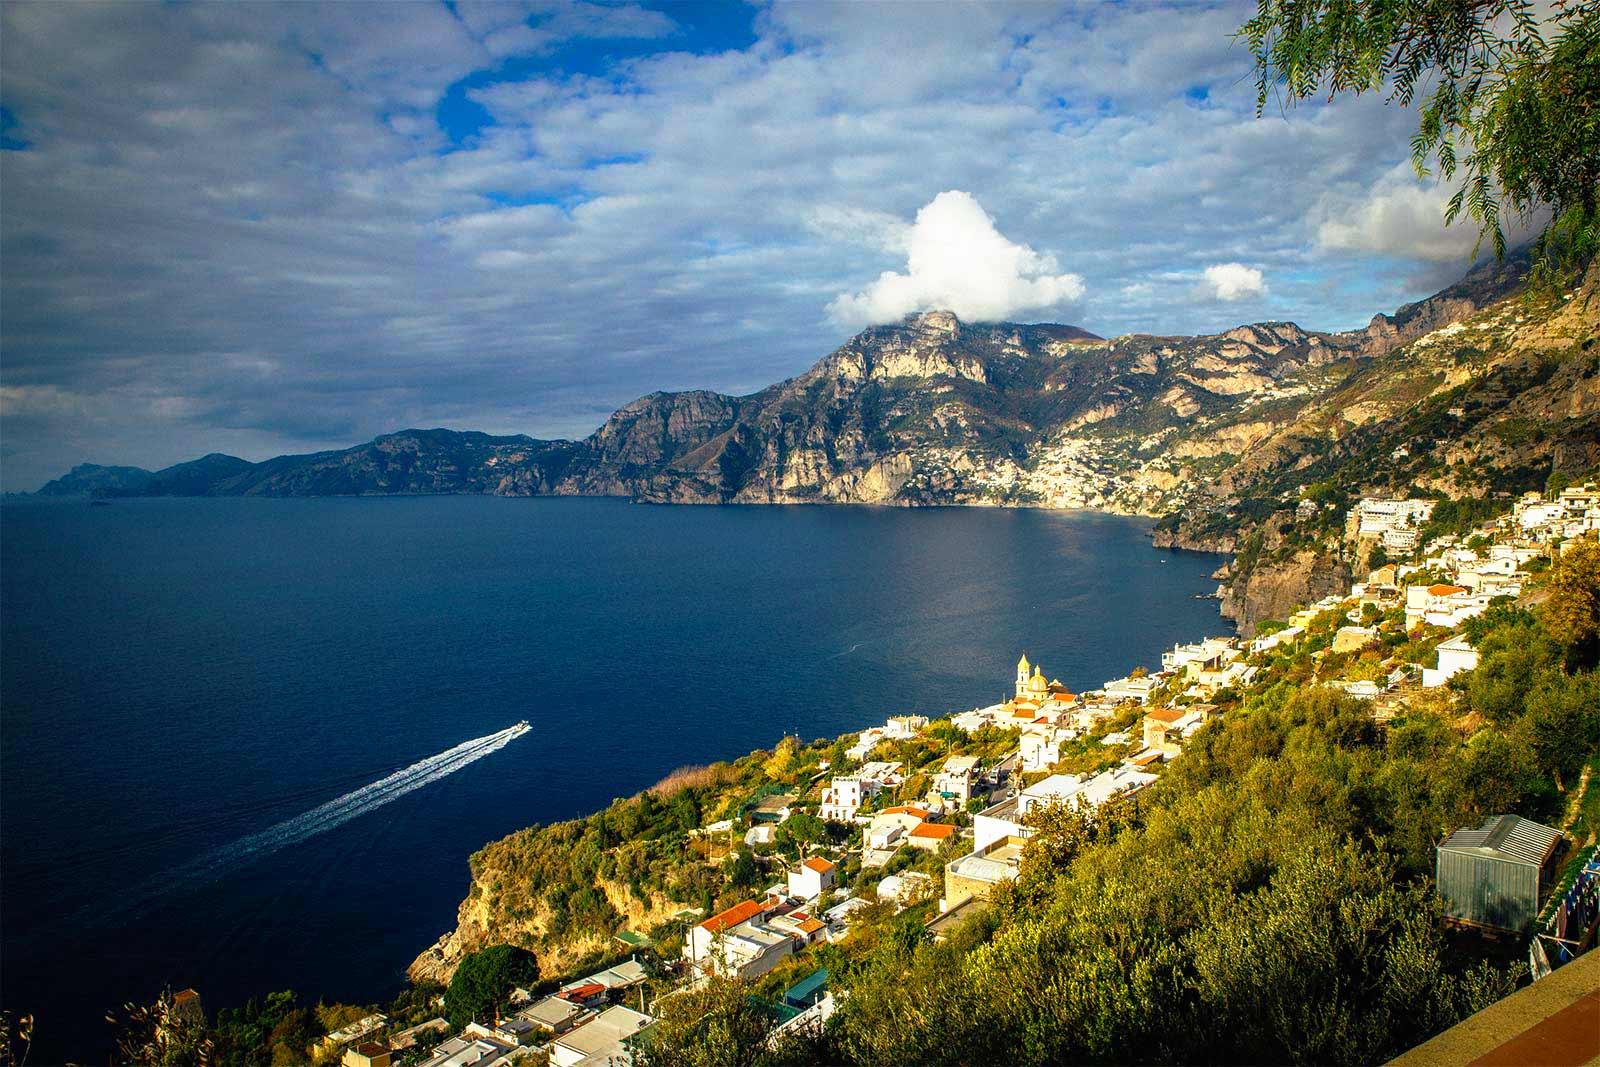 Hotel Margherita Praiano Vacanze Relax In Costiera Amalfitana